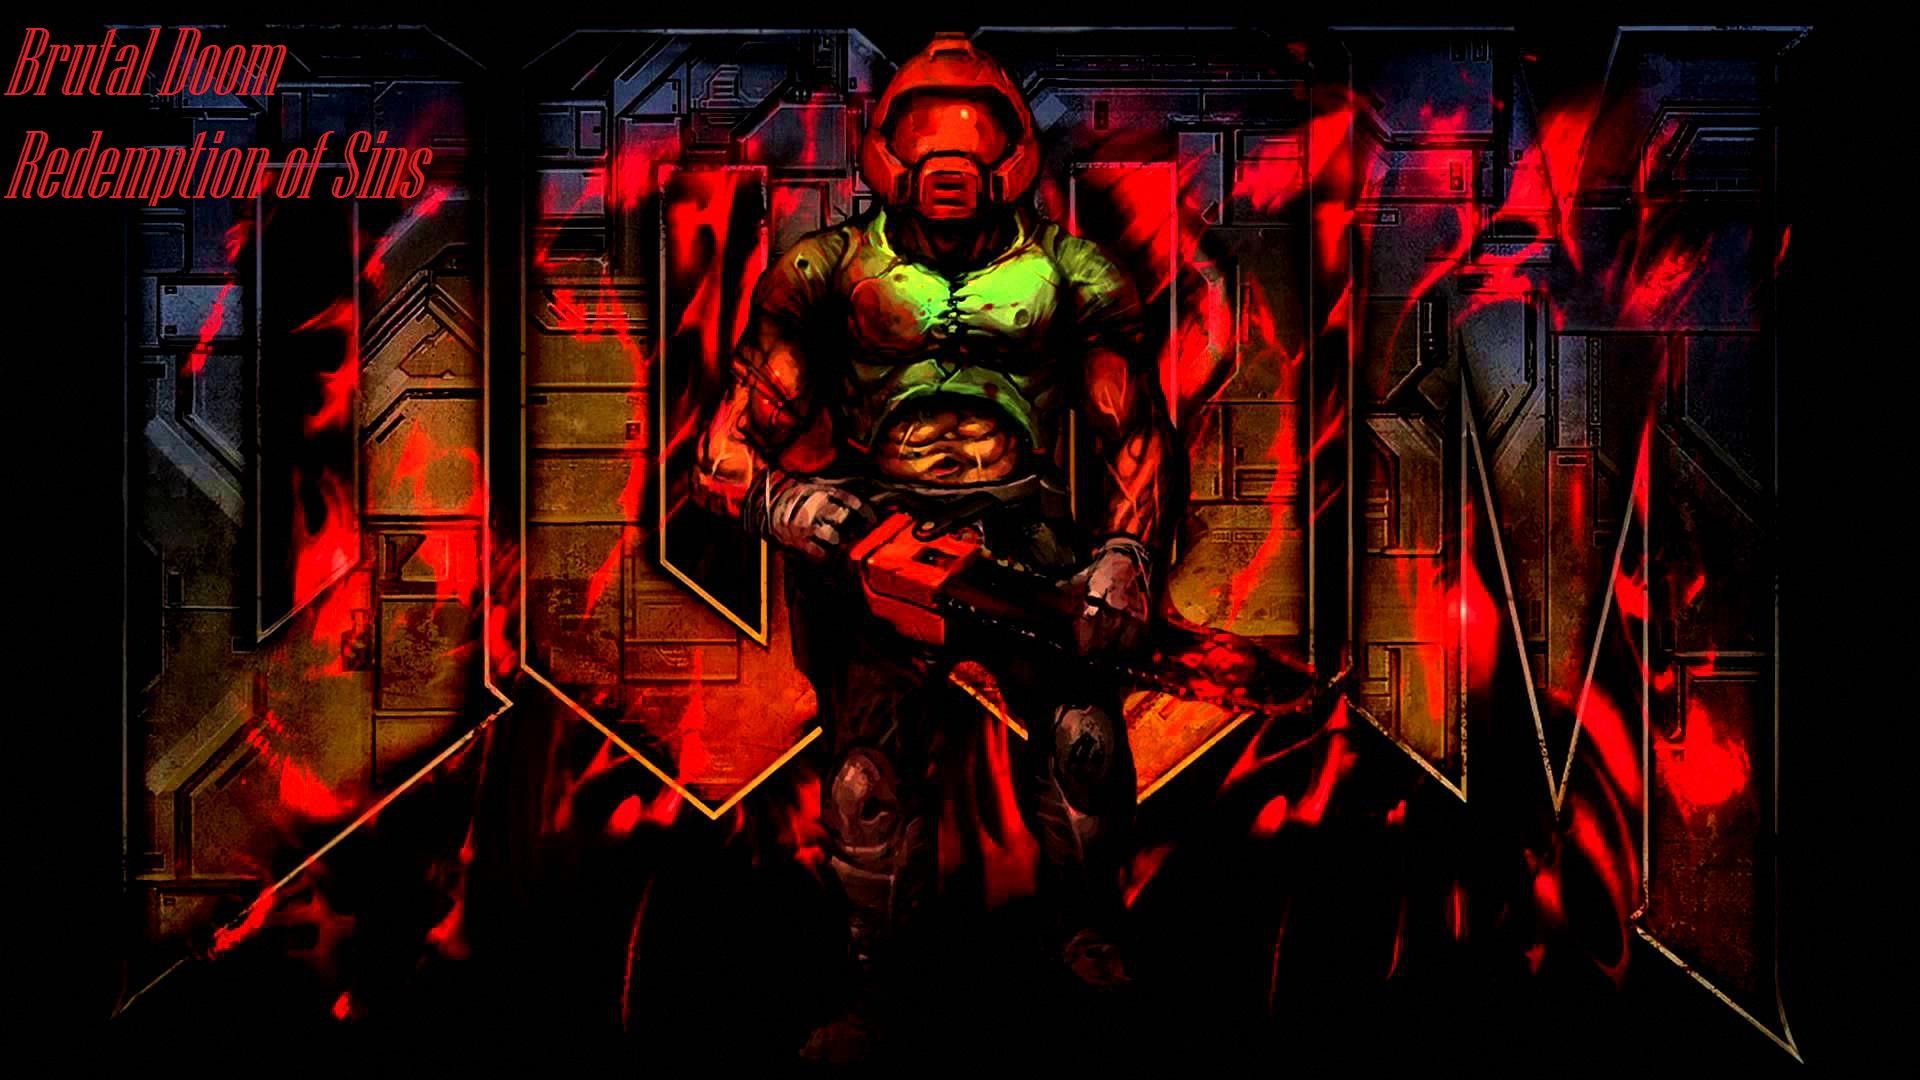 Brutal Doom: Redemption of Sins - Realistic addon - Mod DB